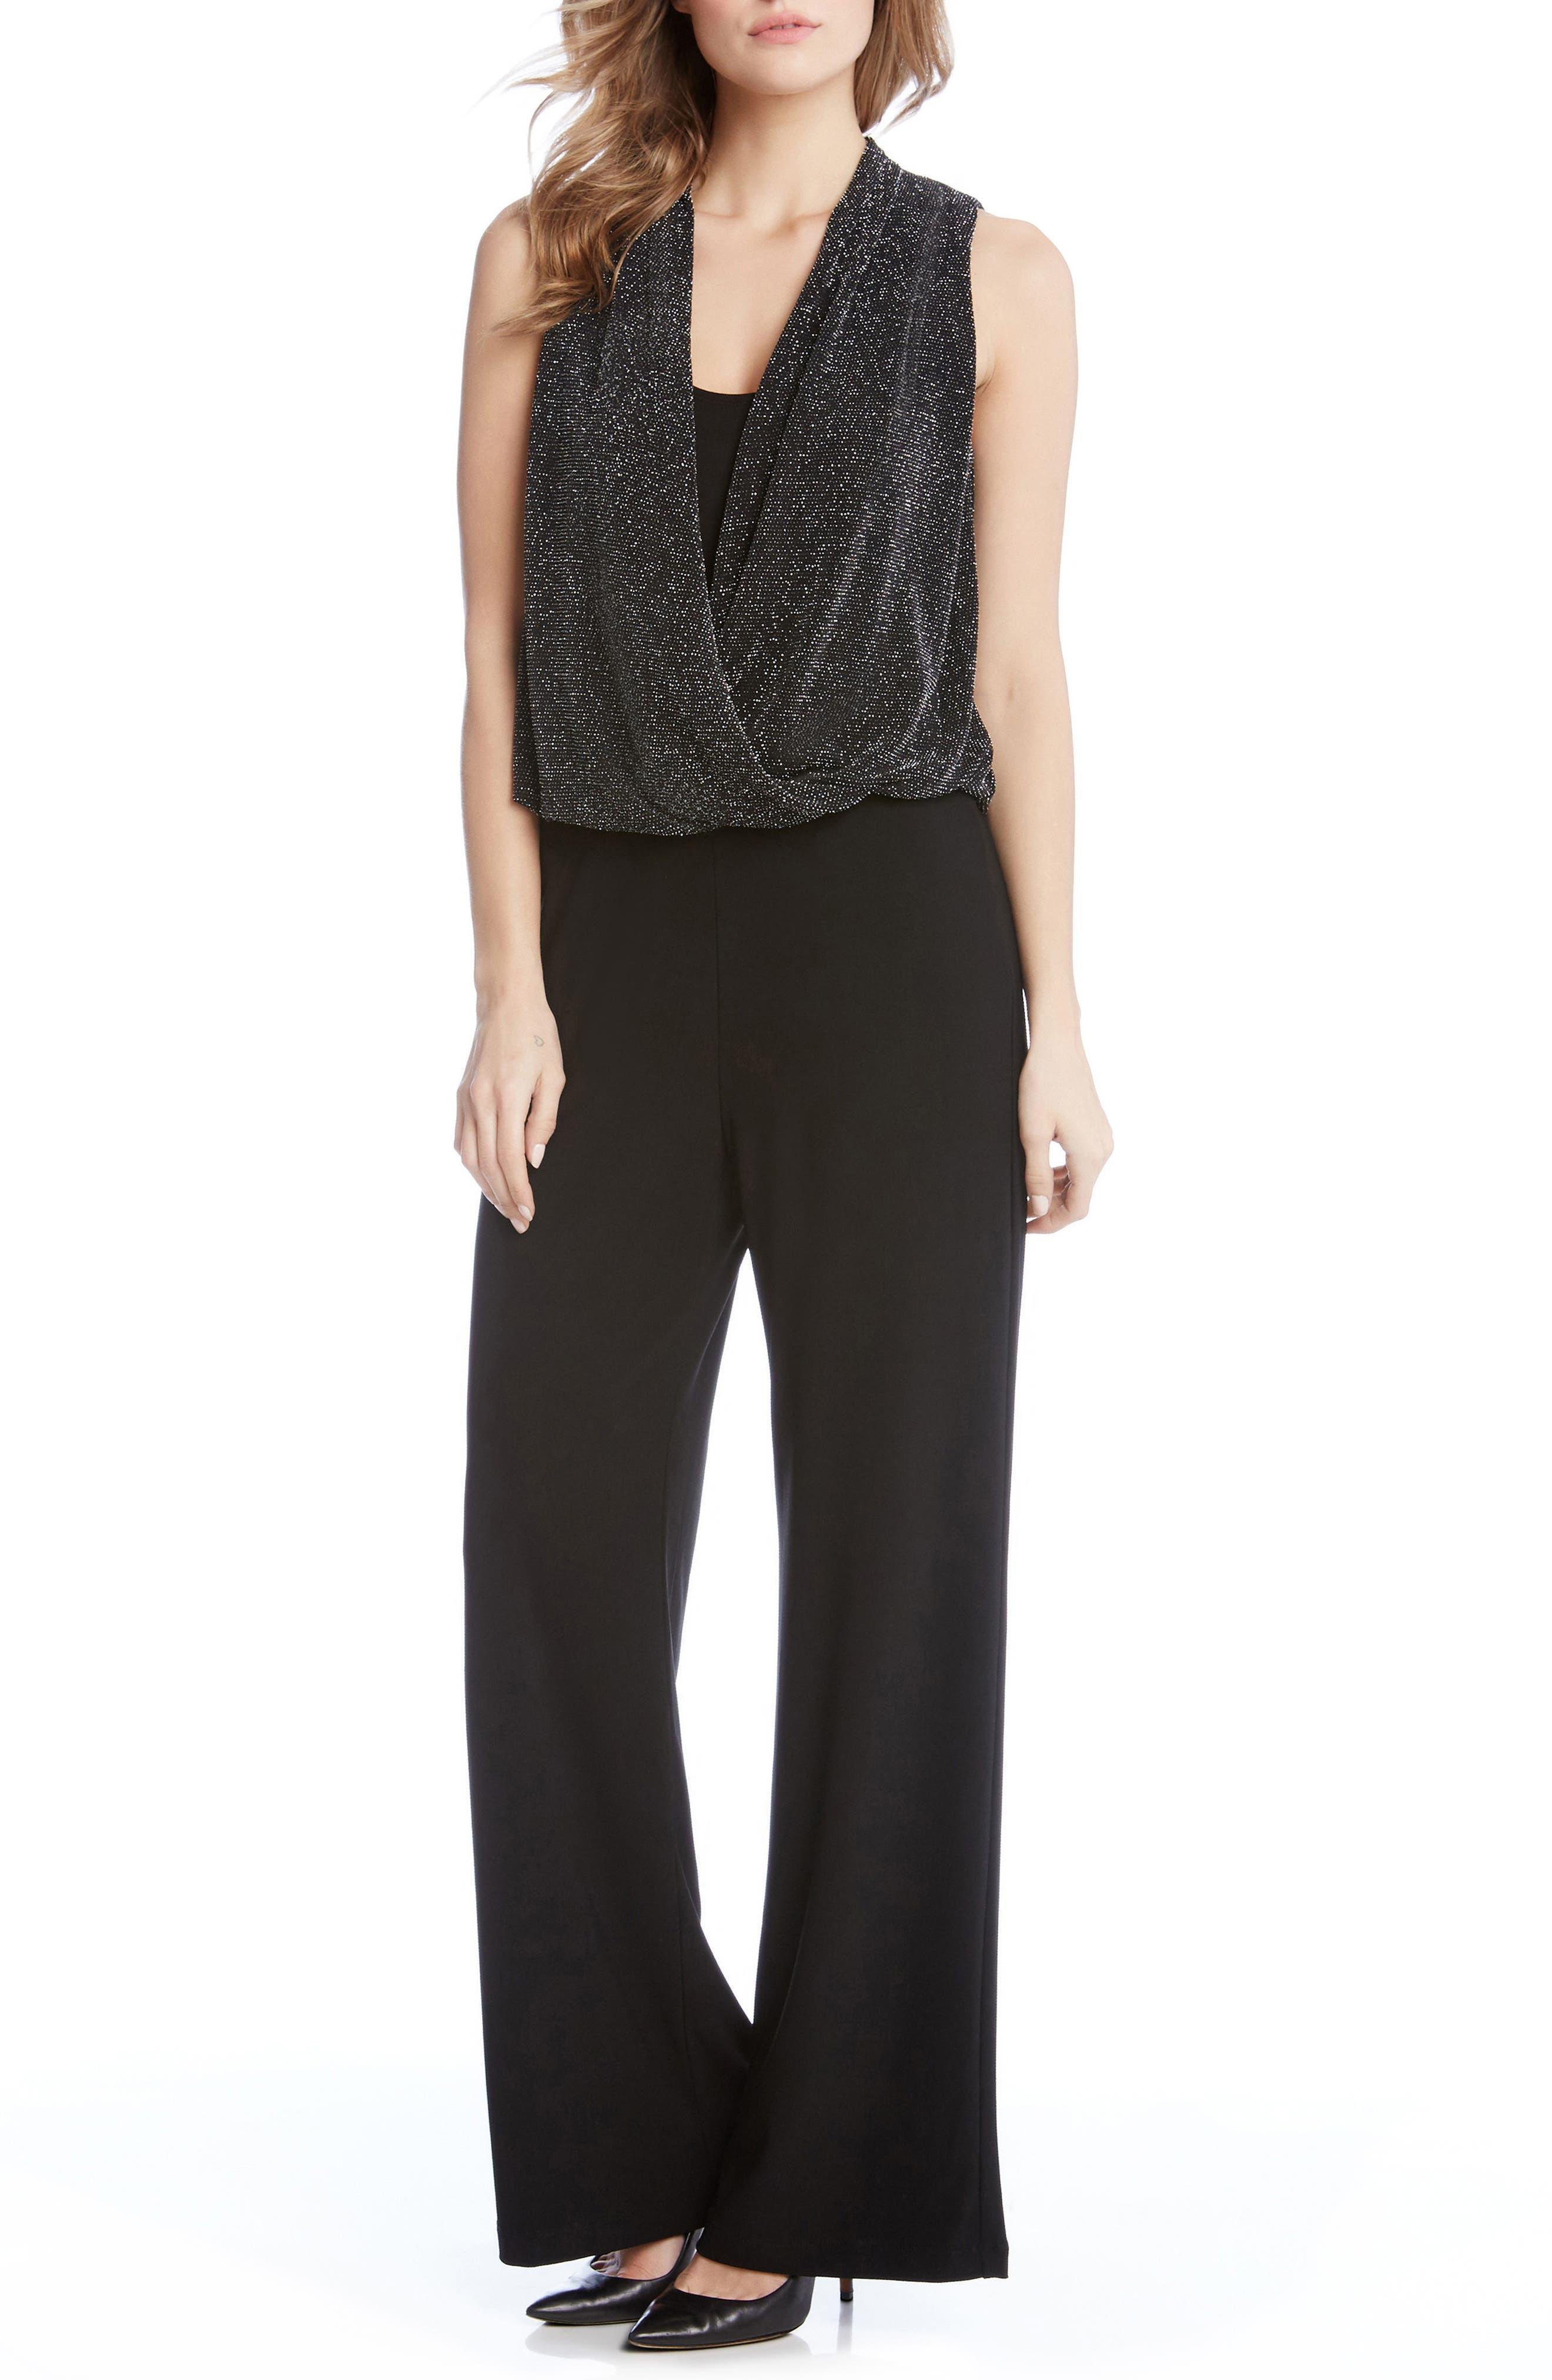 Alternate Image 1 Selected - Karen Kane Sparkle Knit Palazzo Jamupsuit